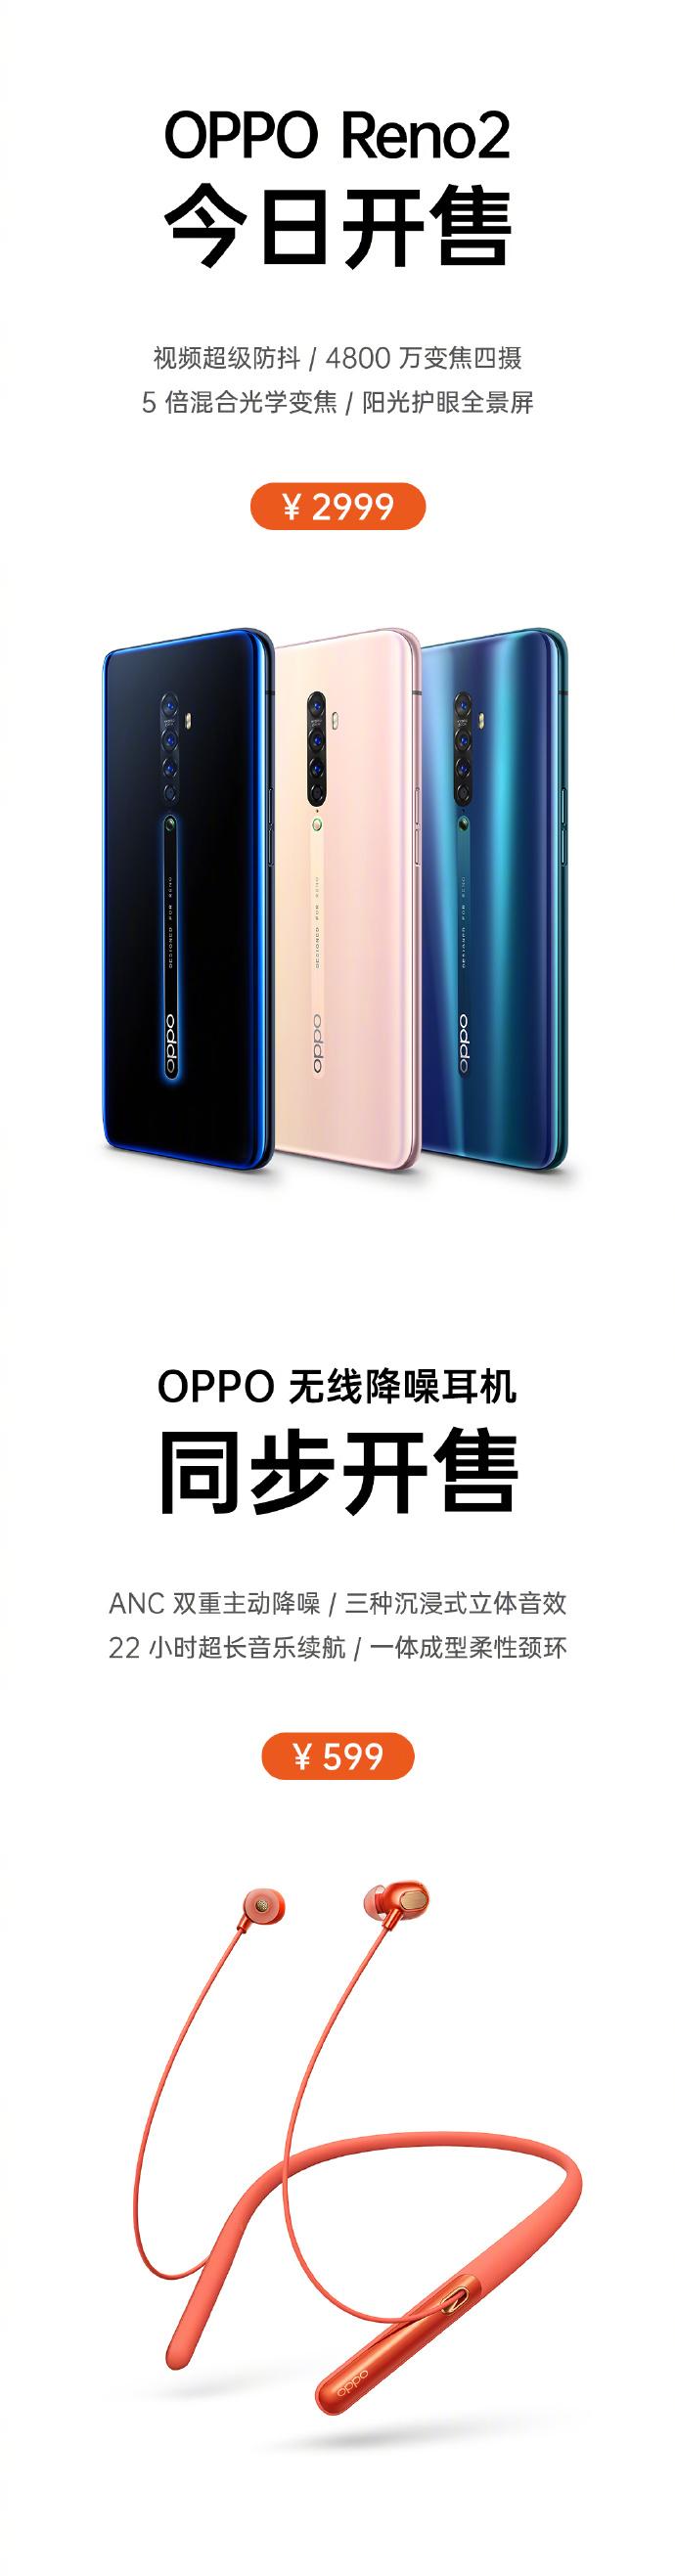 OPPO Reno2首销:骁龙730G 2999元